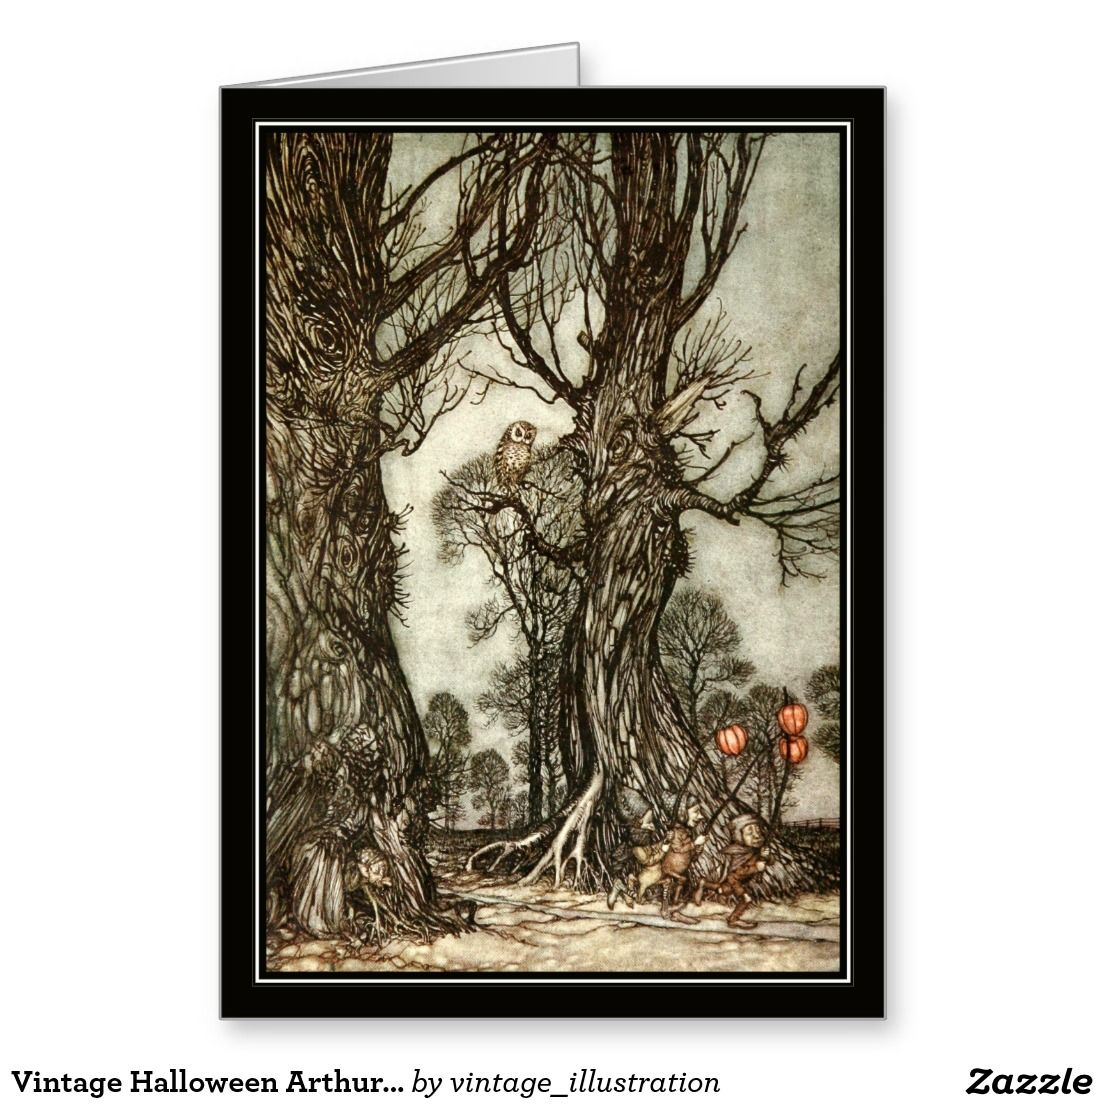 Vintage Halloween Arthur Rackham The Fairy Ball Greeting Card - Creepy Trees and Fairy Lanterns!